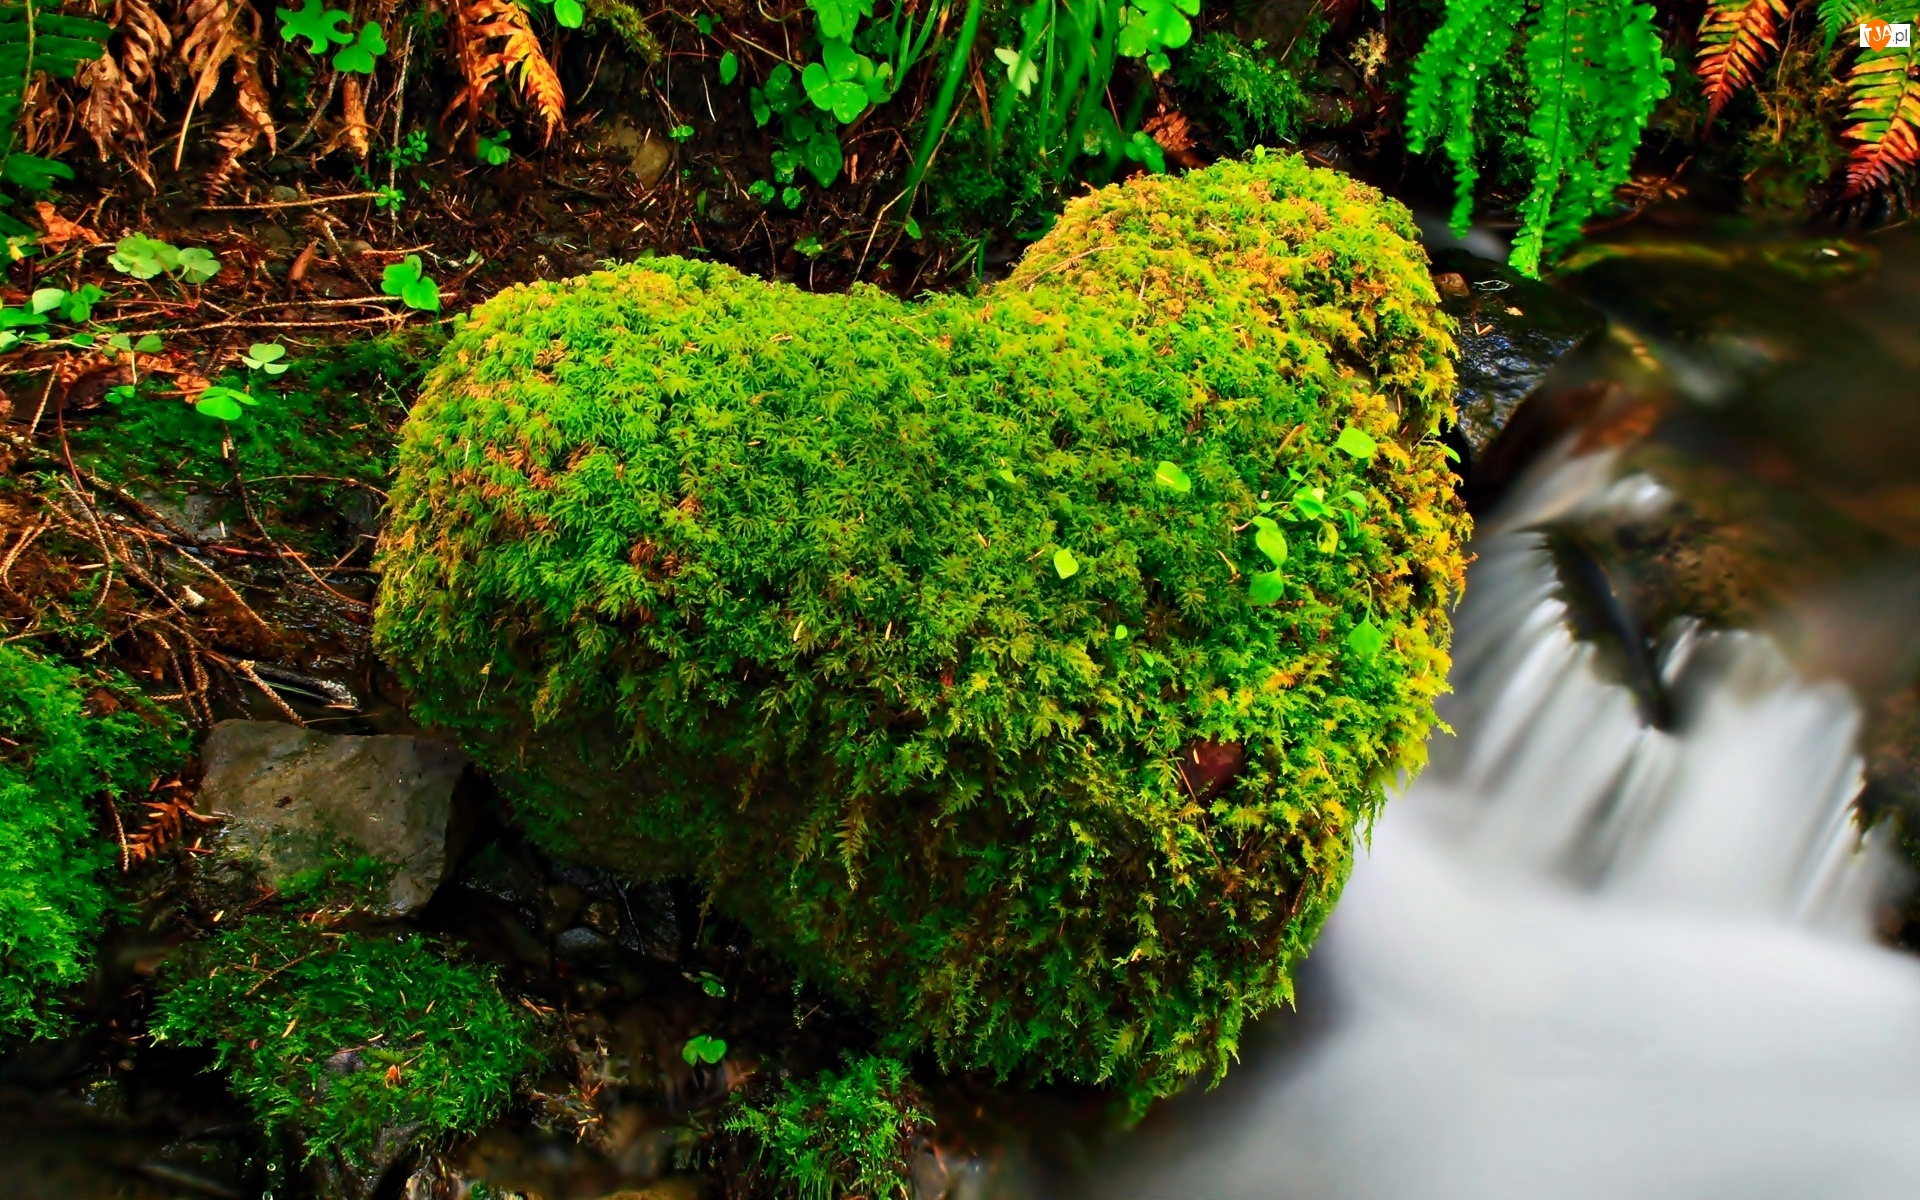 Wodospad, Mech, Kamień, Serce